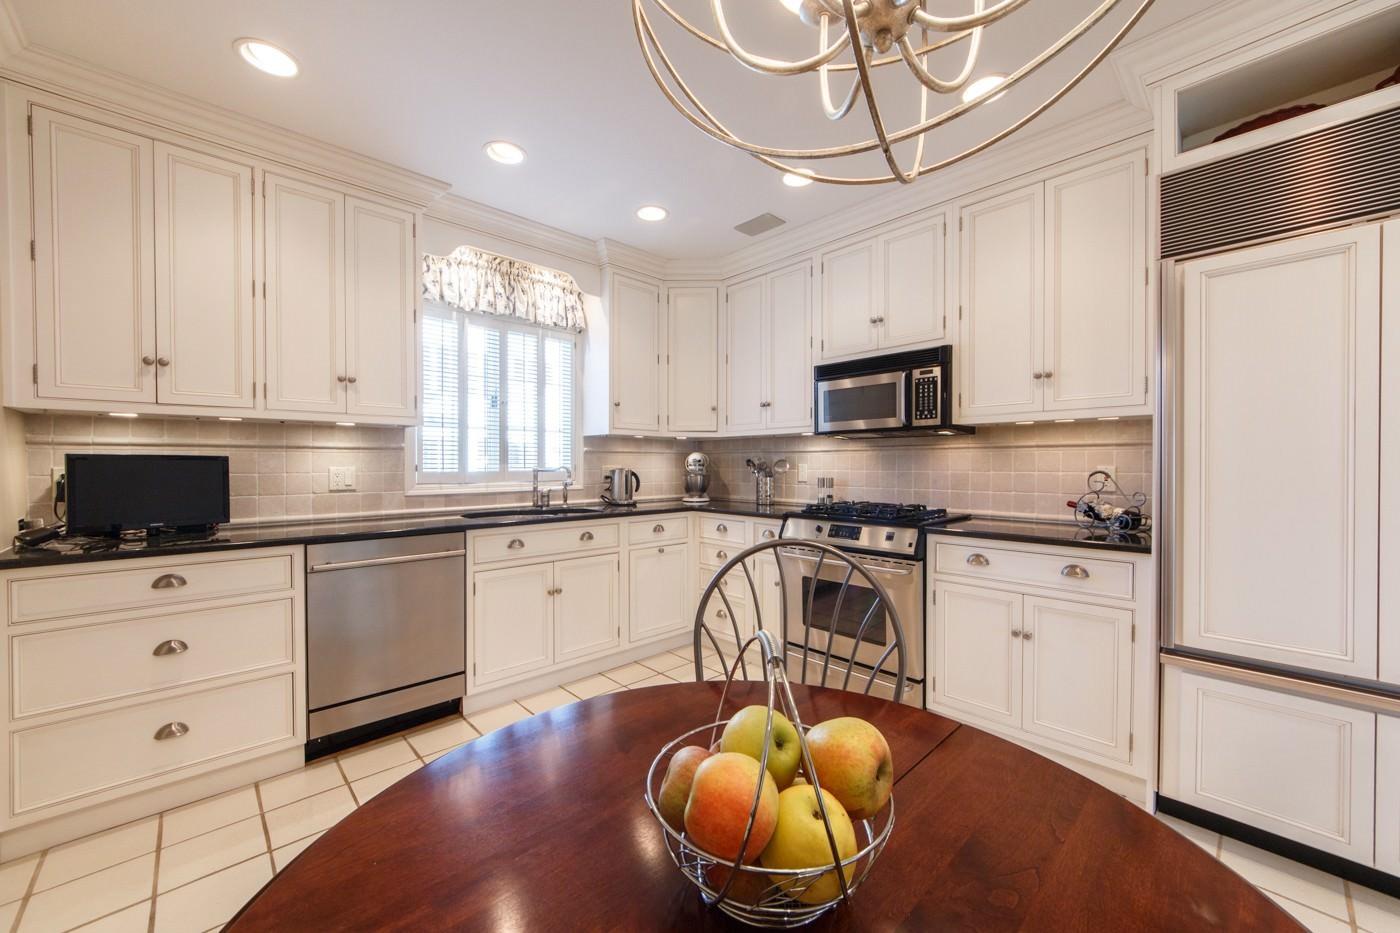 Kitchen cabinets summit nj - 50 New England Ave Unit A Summit Nj 07901